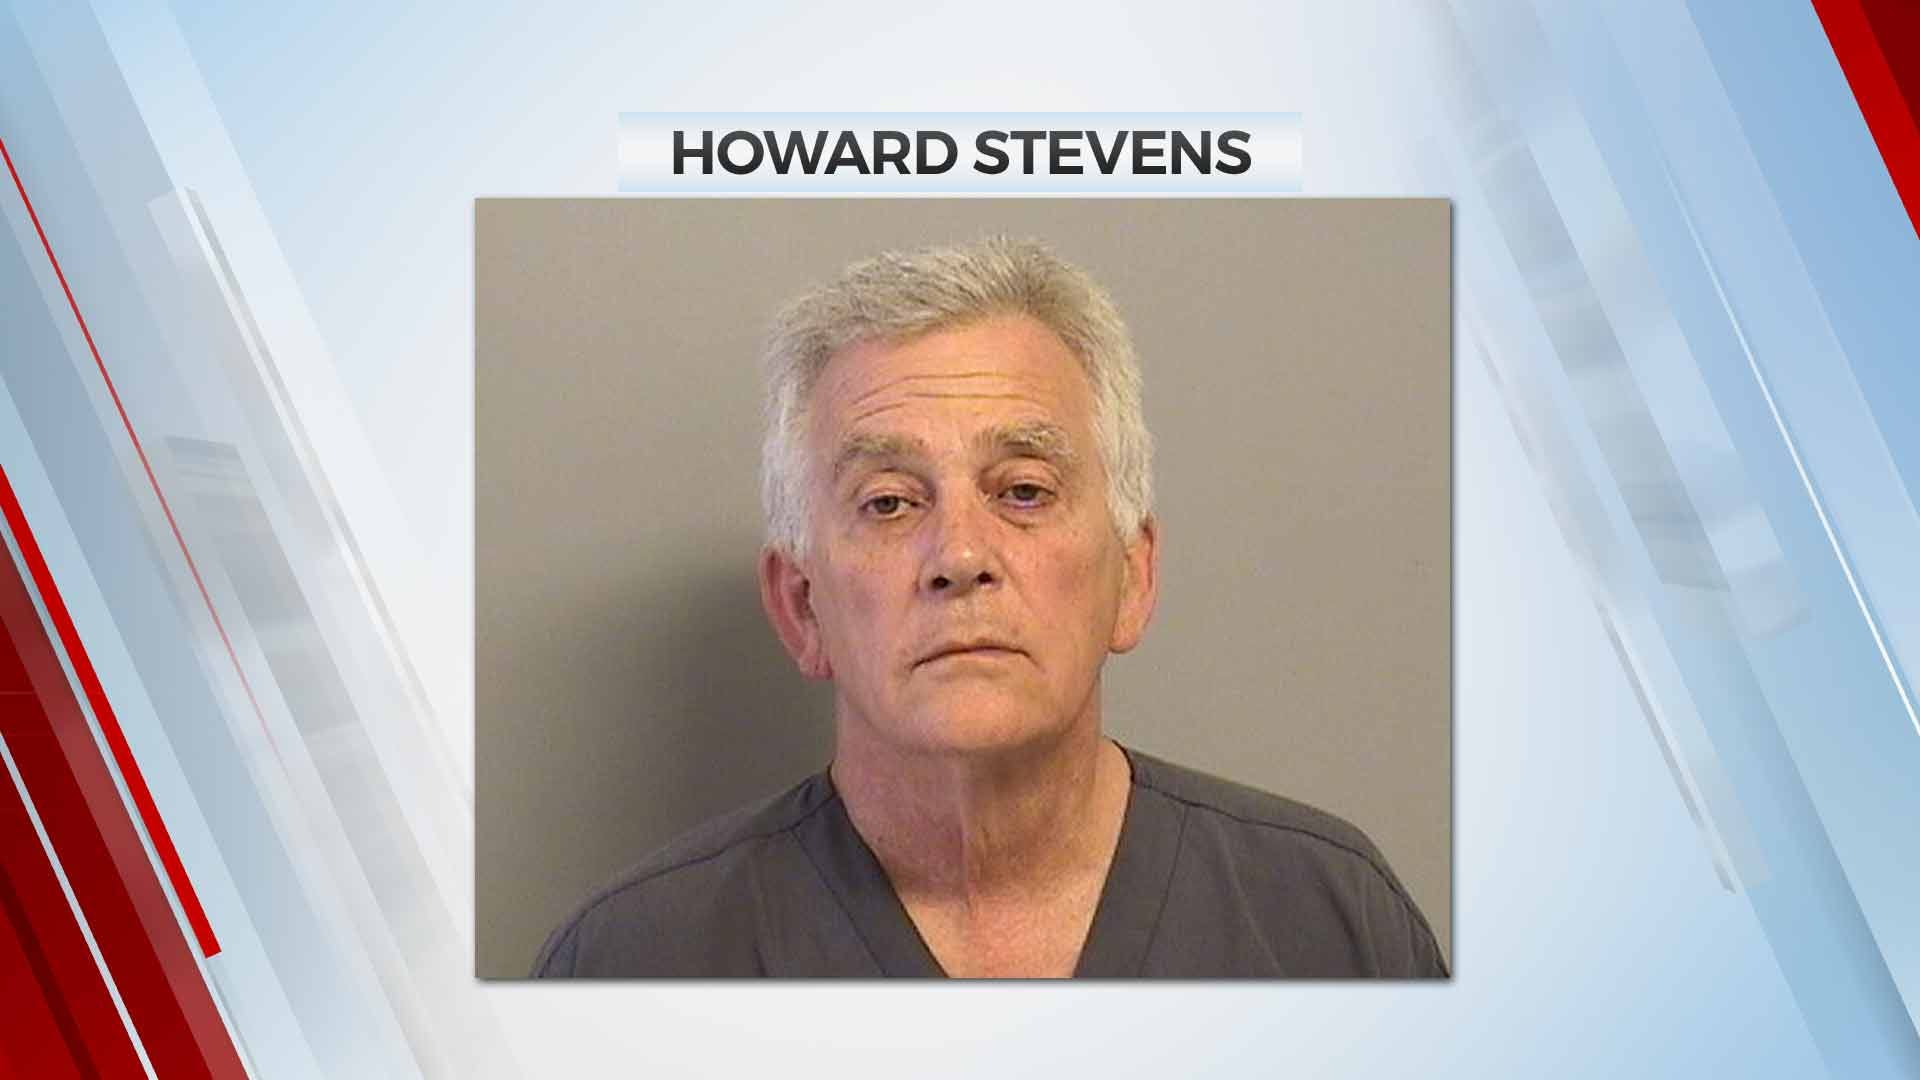 Tulsa Business Owner Arrested On Child Pornography Complaints